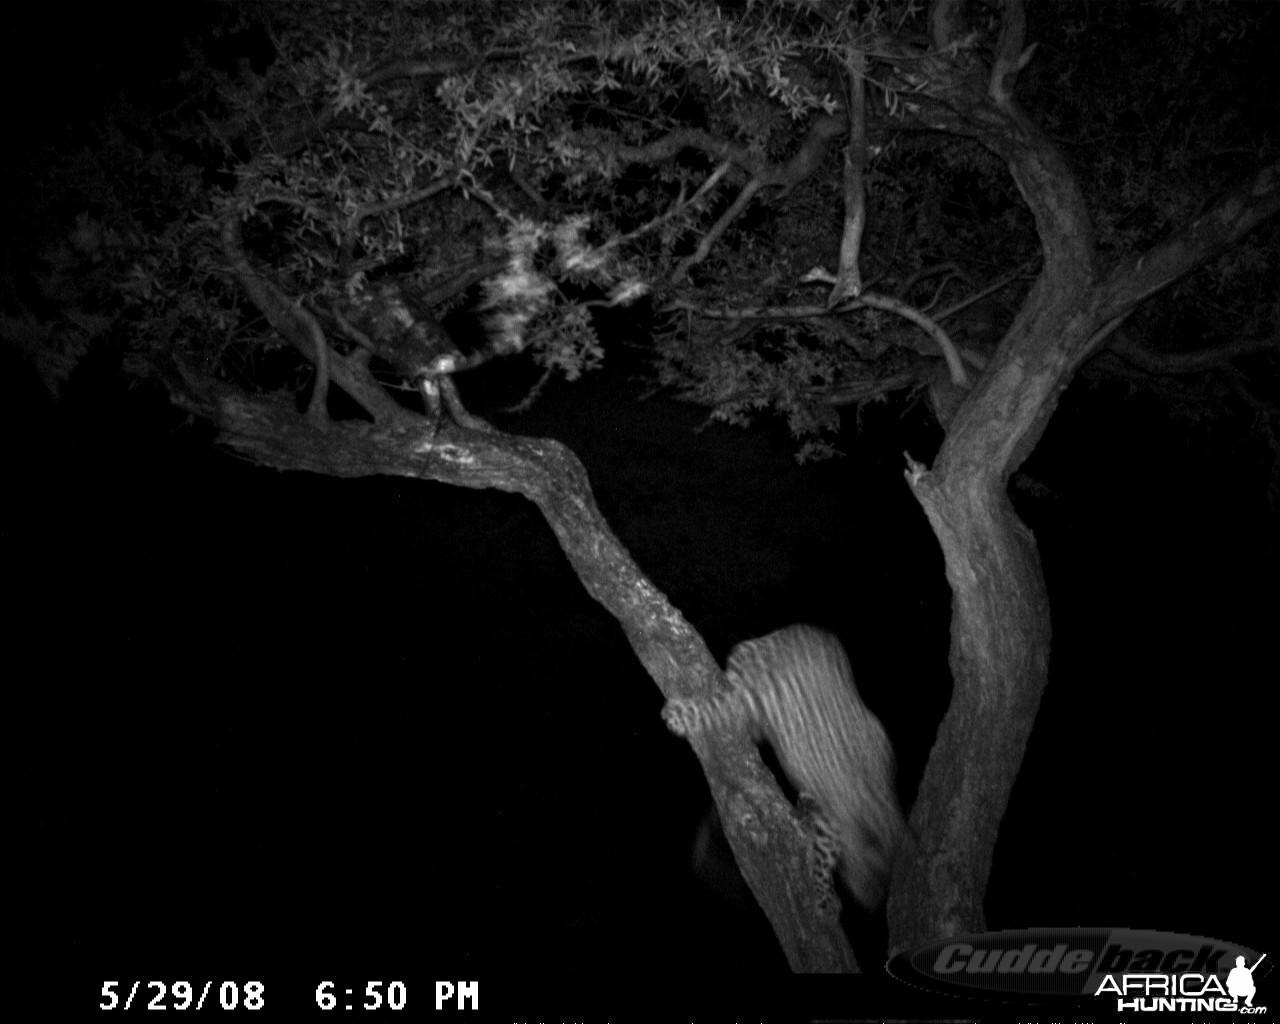 Hunting Leopard on Bait at Ozondjahe Safaris Namibia